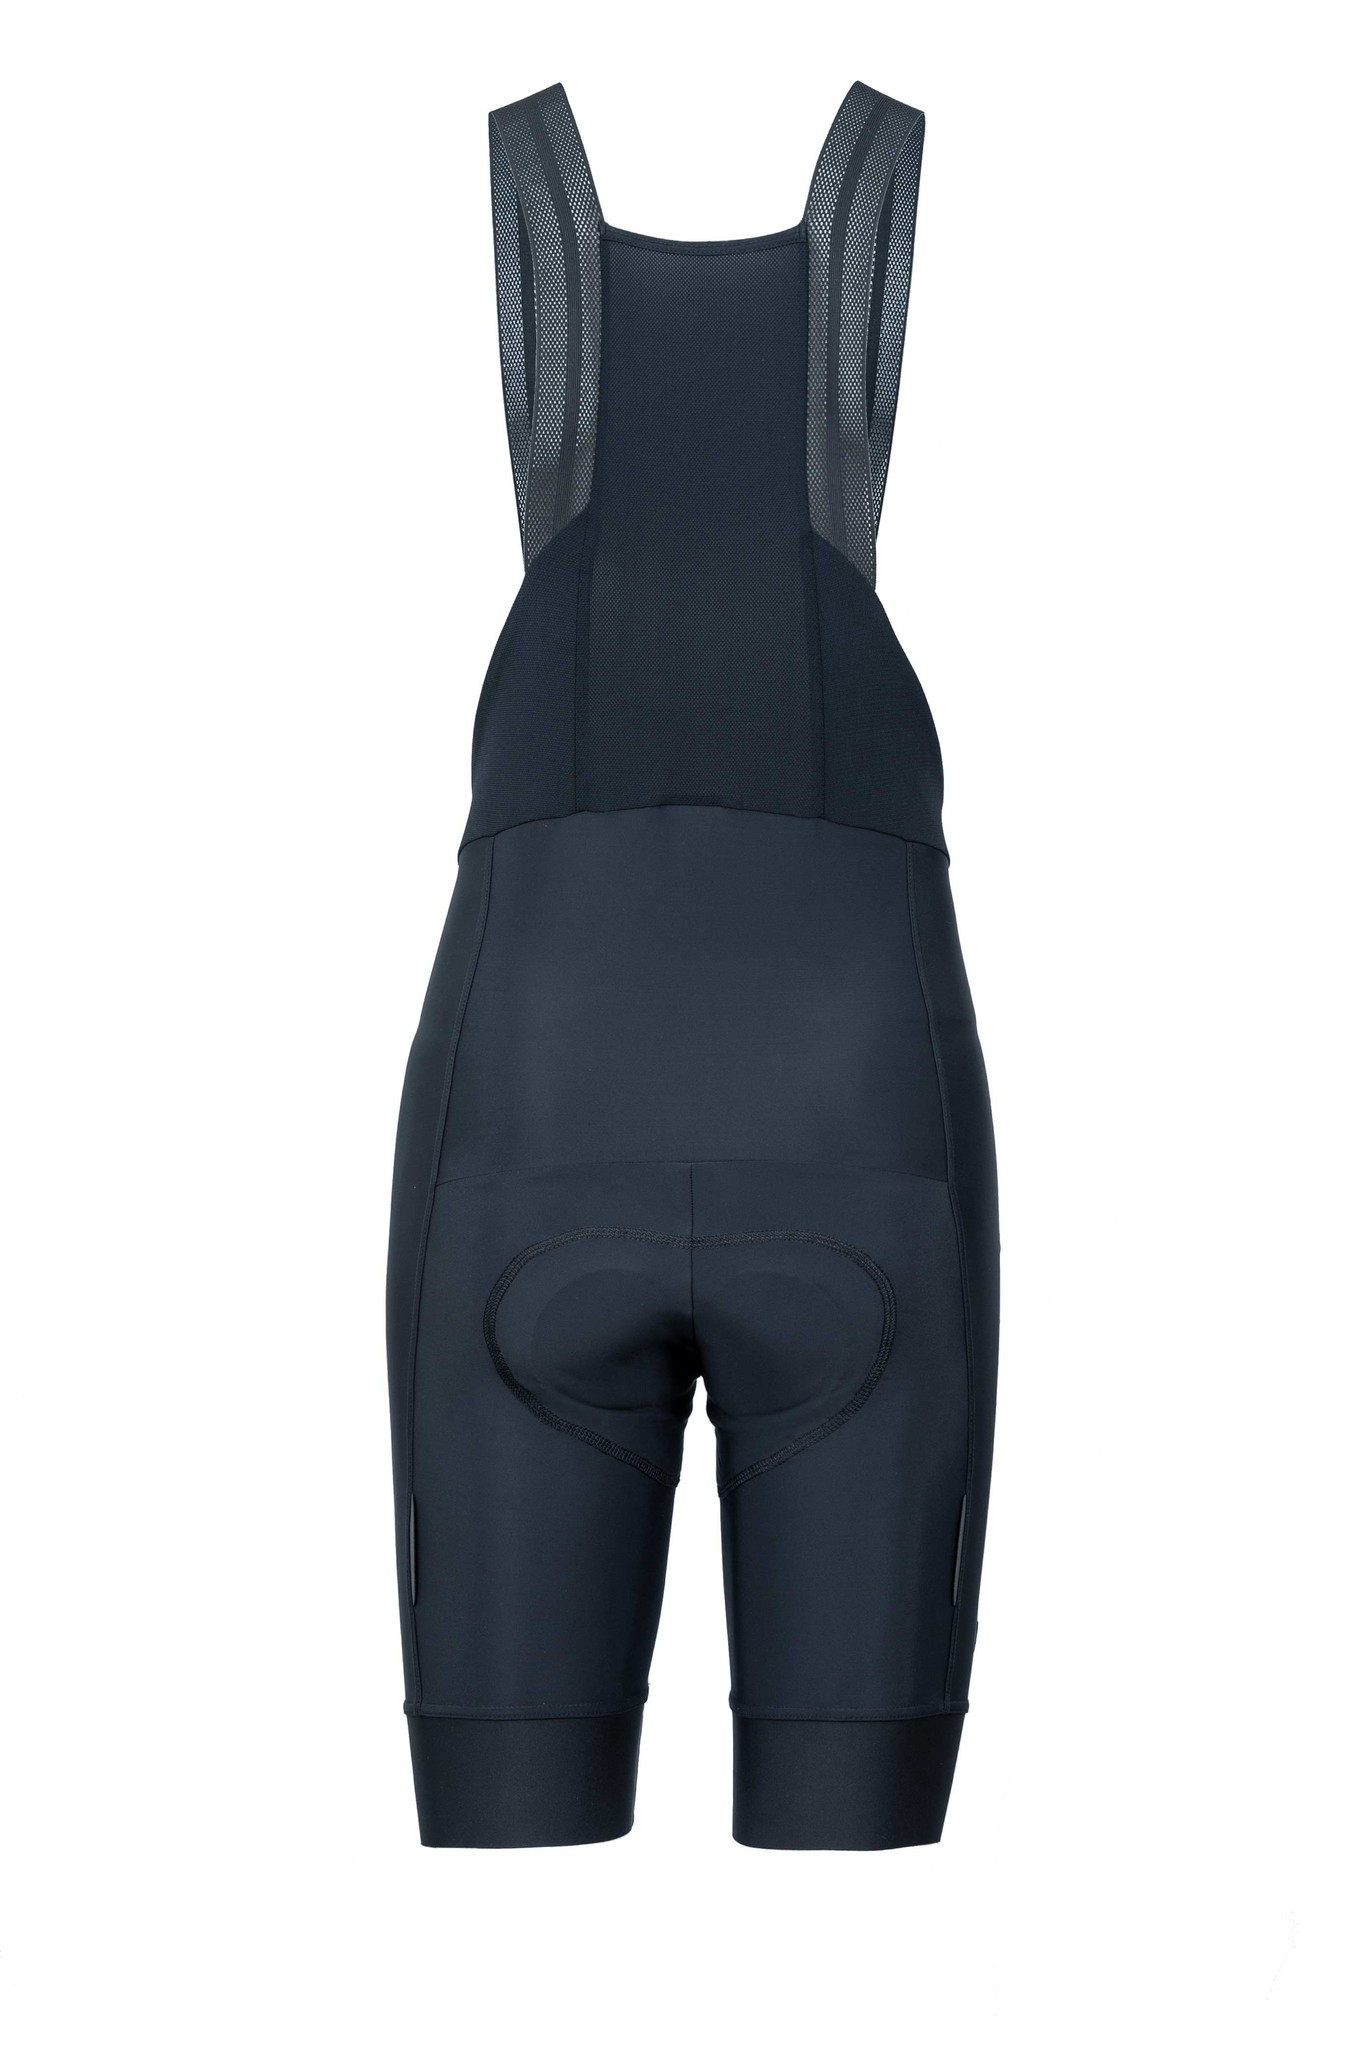 Men's Rouleur Bib Shorts | Black-2